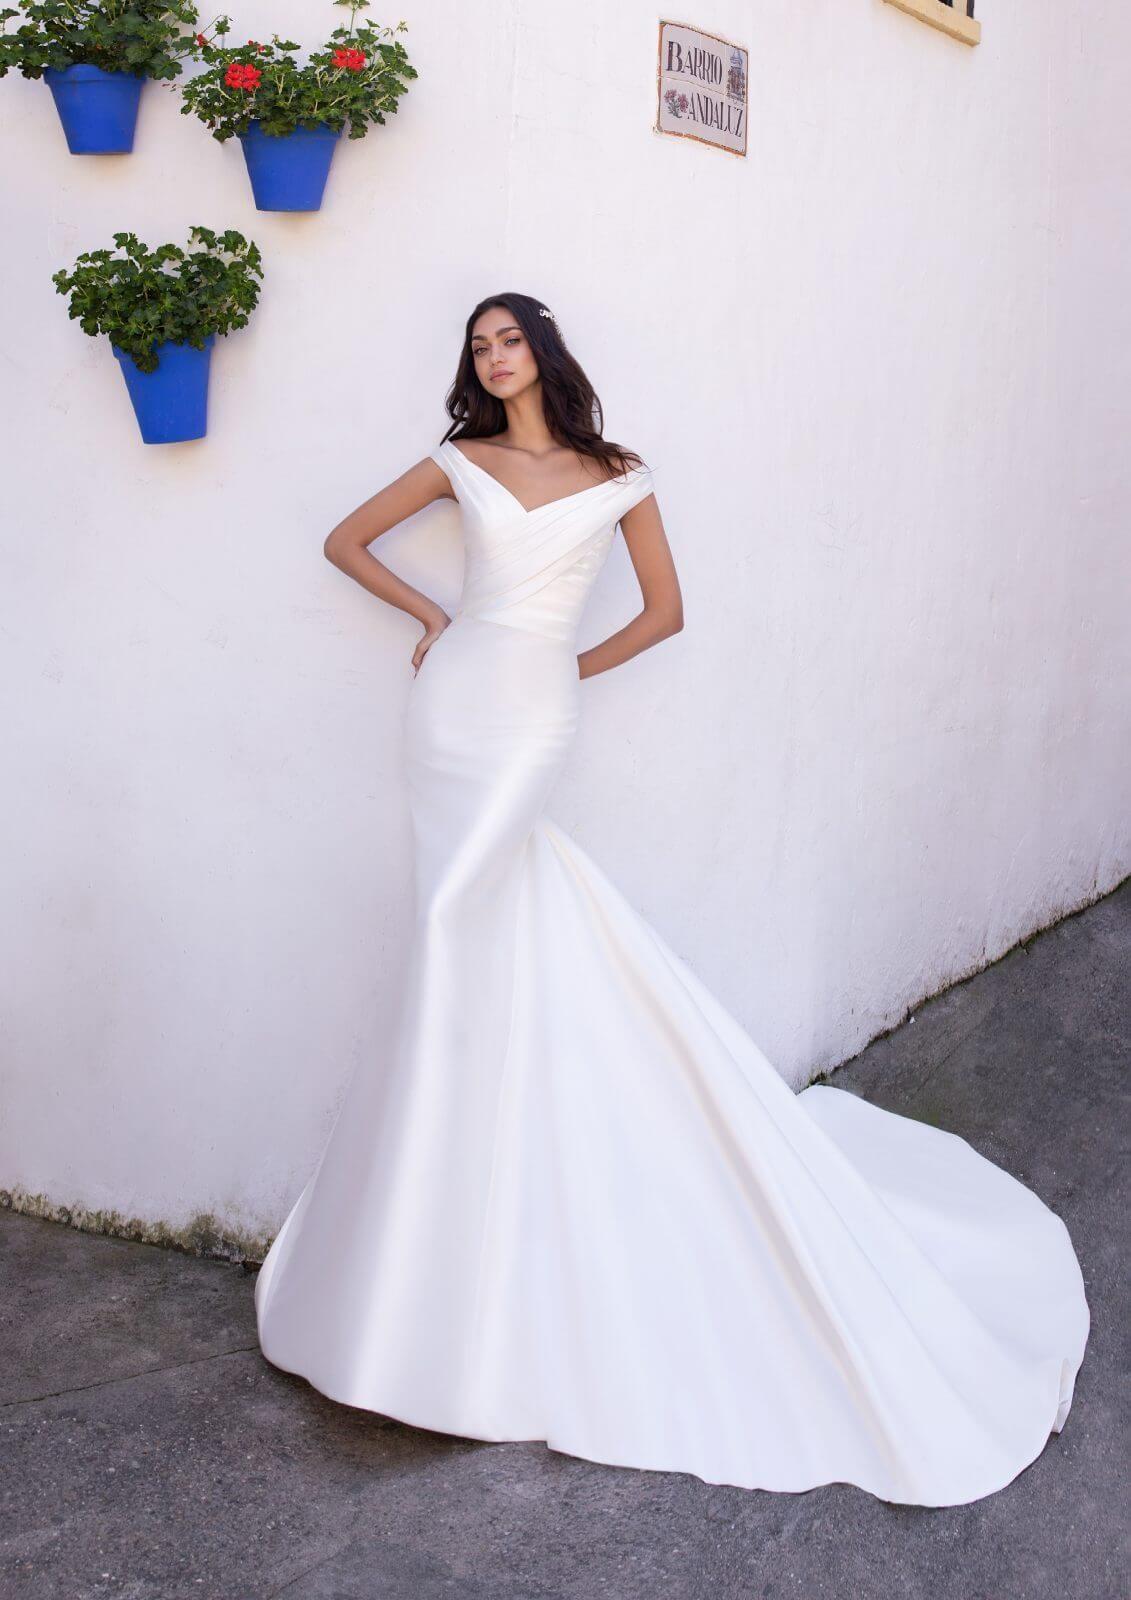 Pronovias Wedding Dresses 2018 In 2020 Pronovias Wedding Dress Wedding Dresses Bridal Dresses